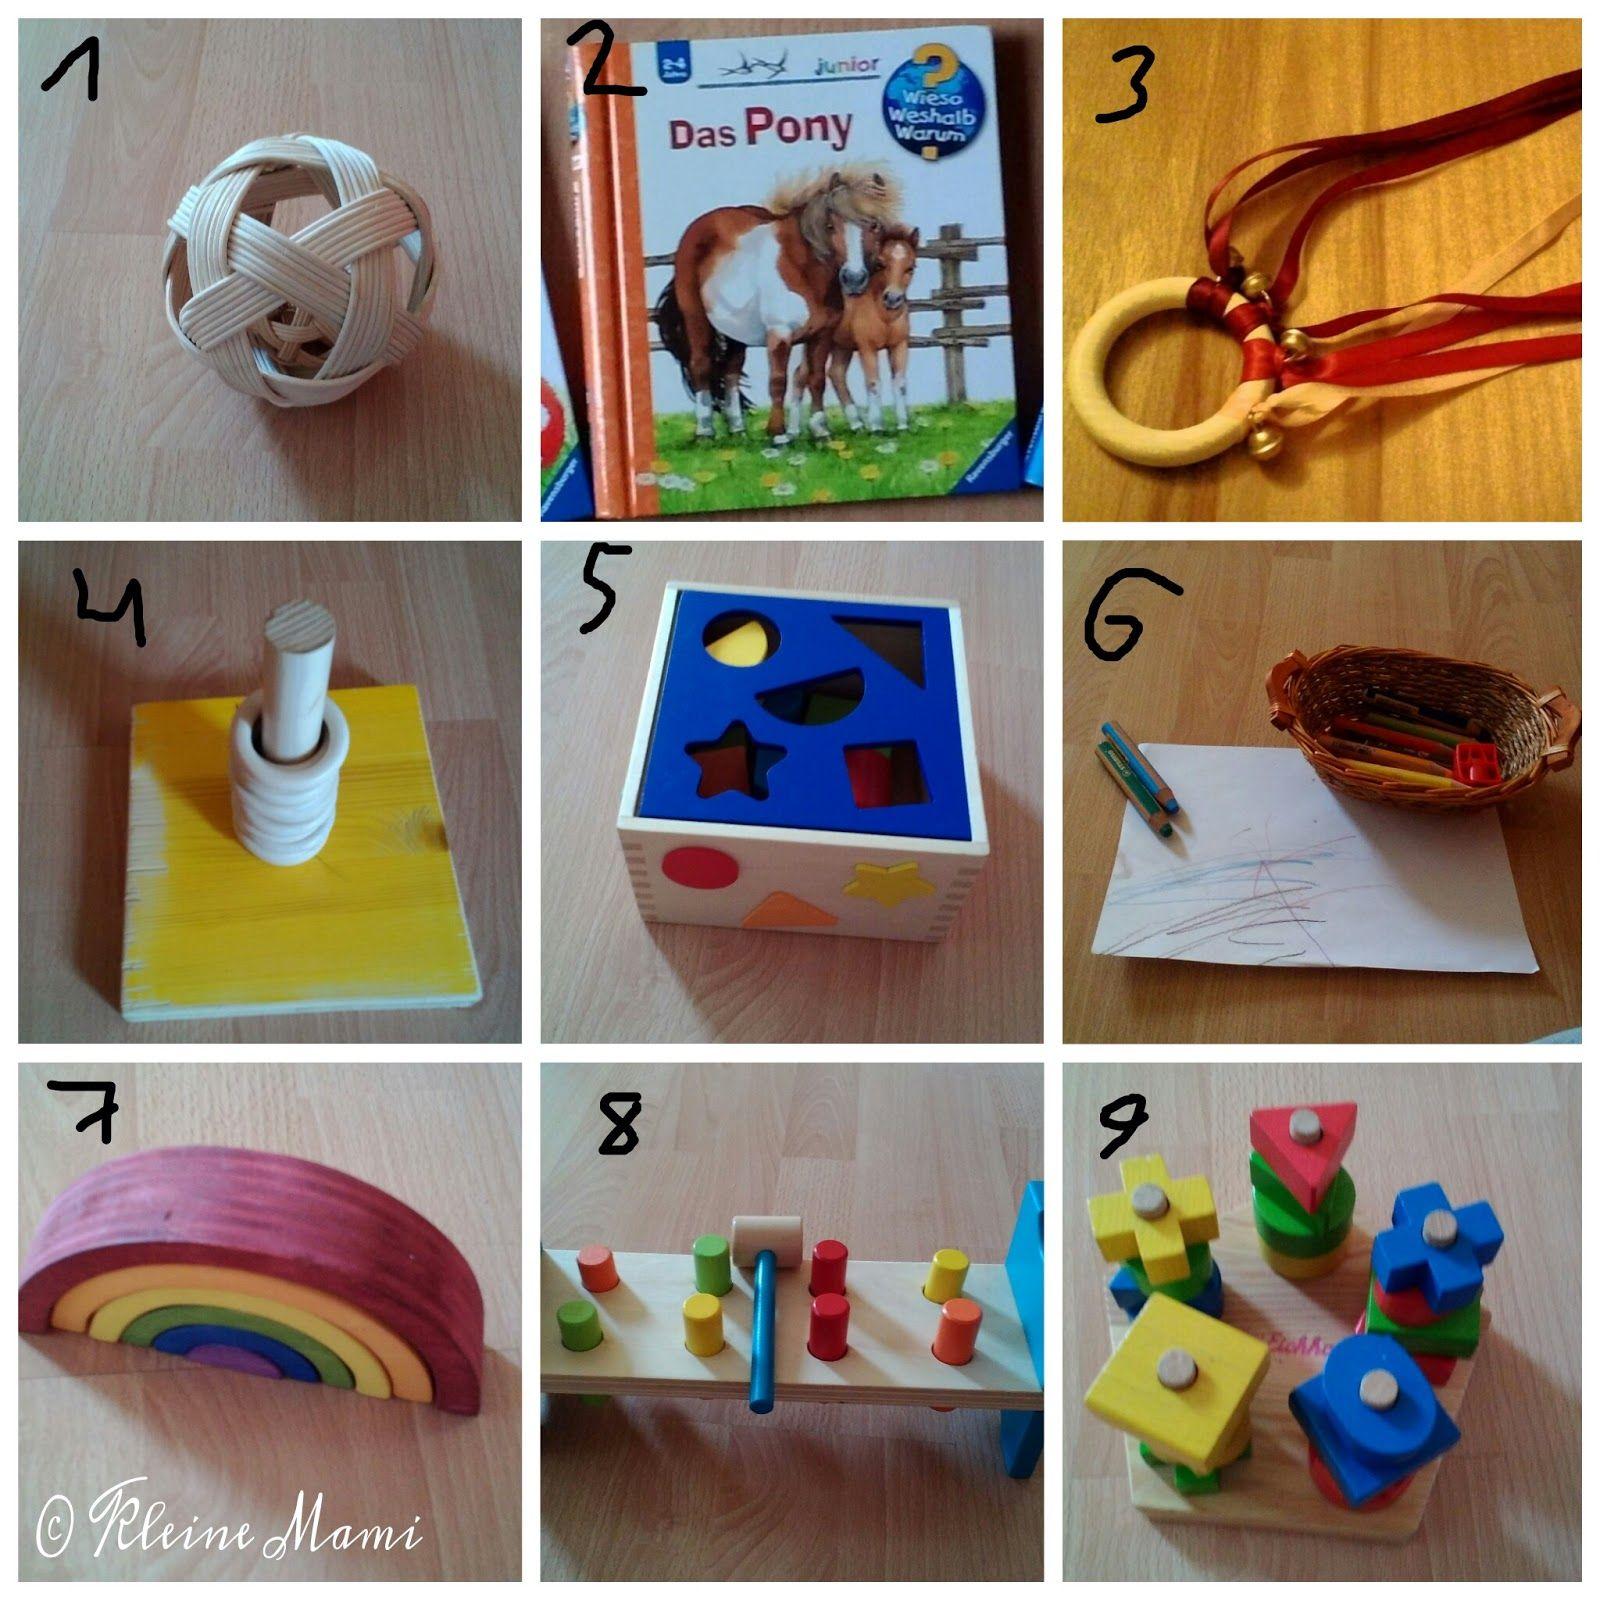 de babyspielzeug selber machen — thuetimescityparkhill